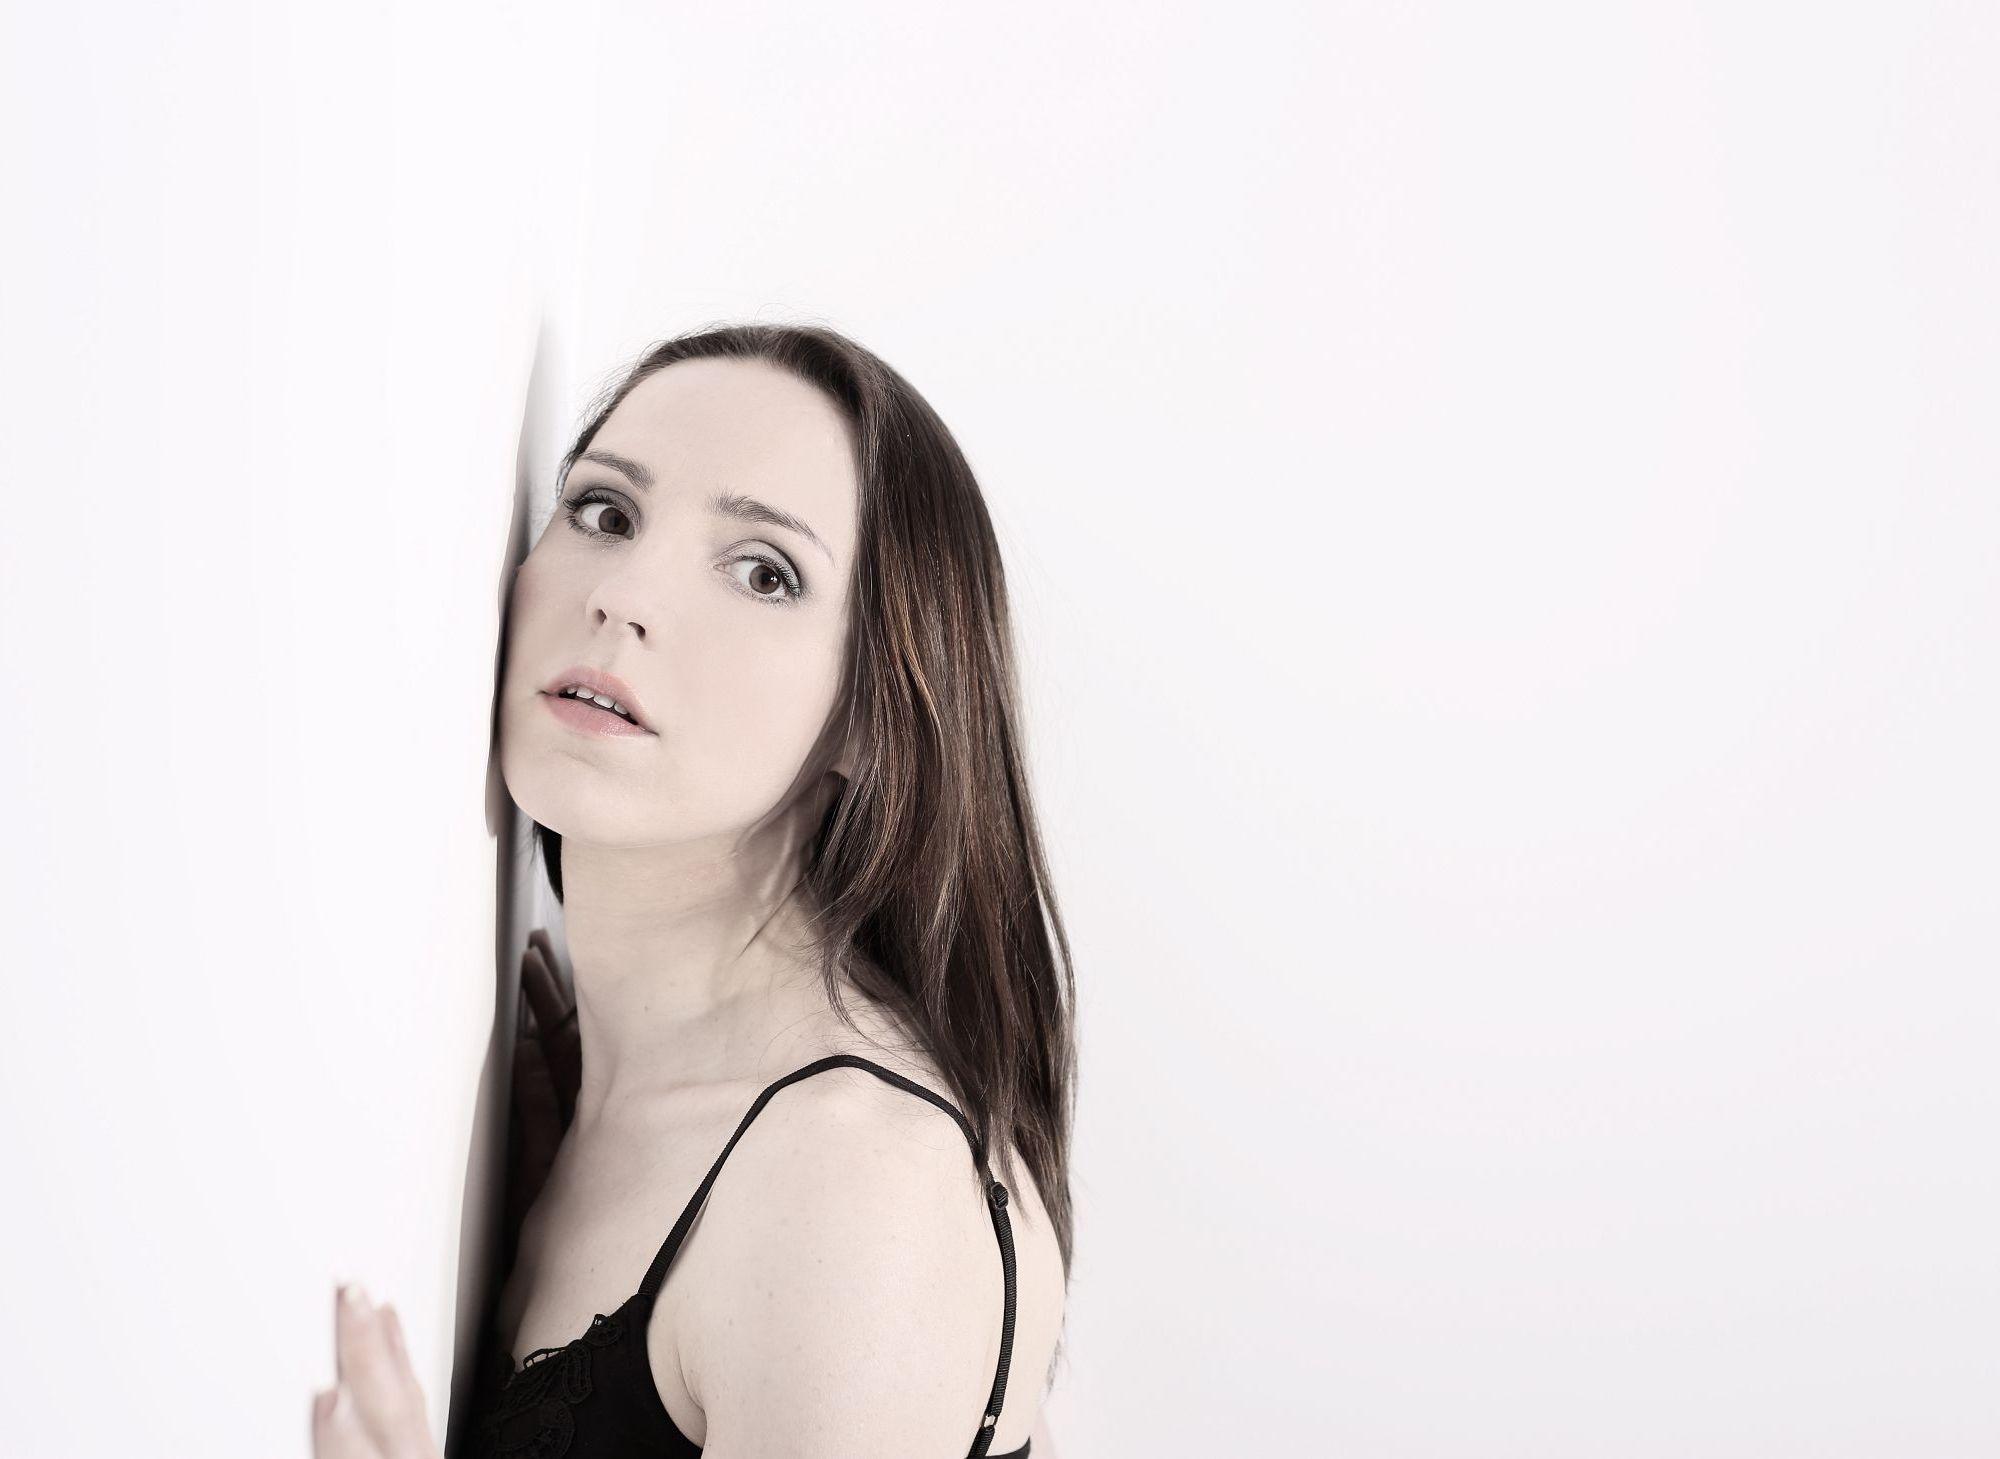 Olesya Golovneva / Foto @ Kerstin Kühne